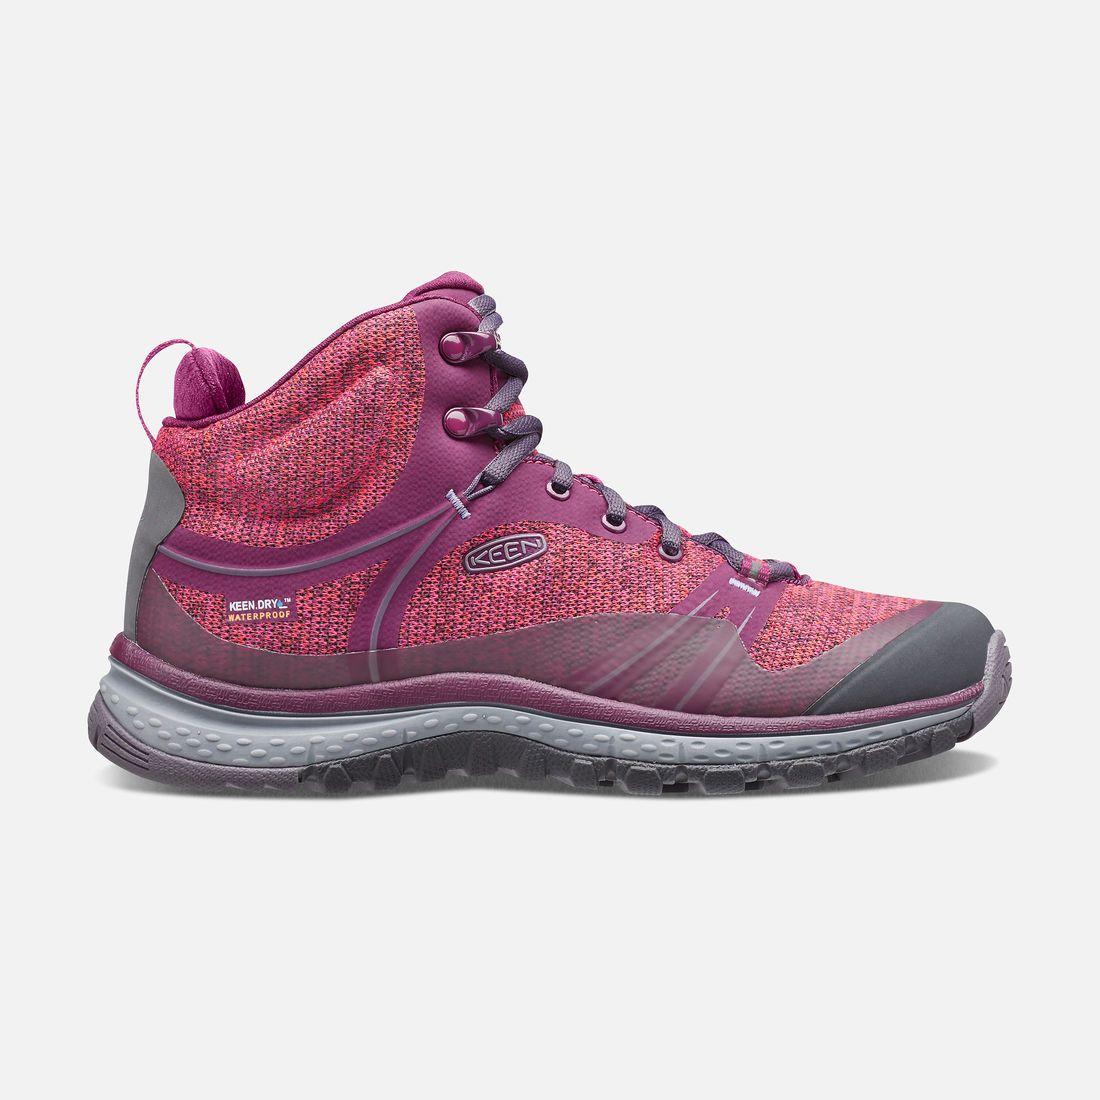 Keen Shoes Utah